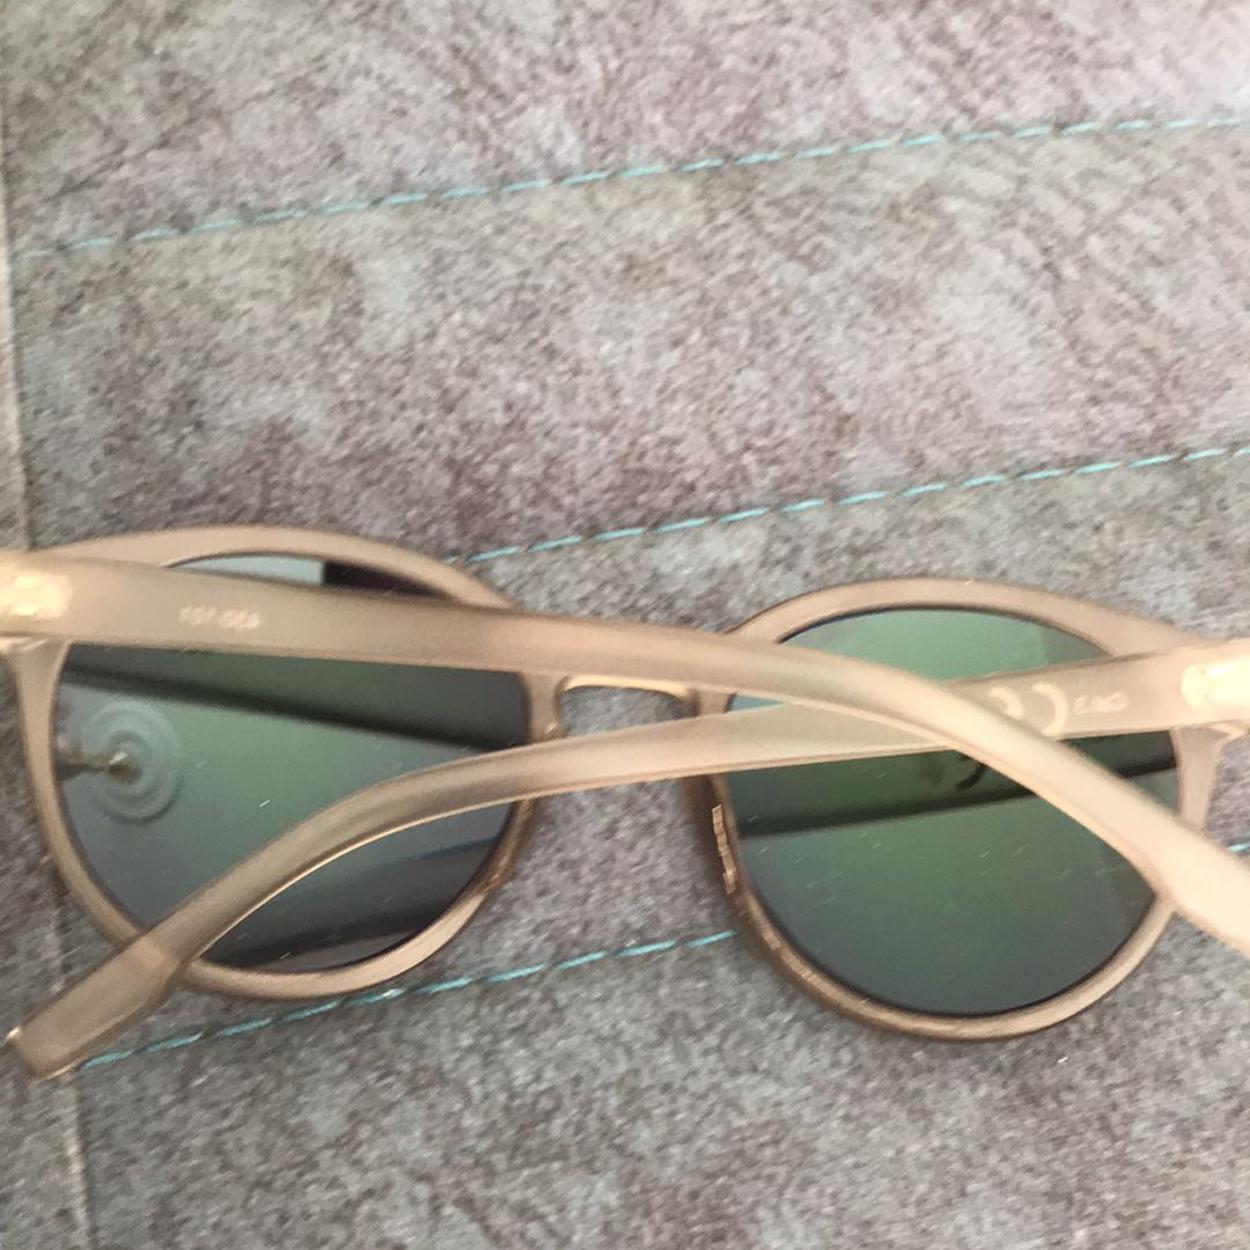 SIX Gözlük